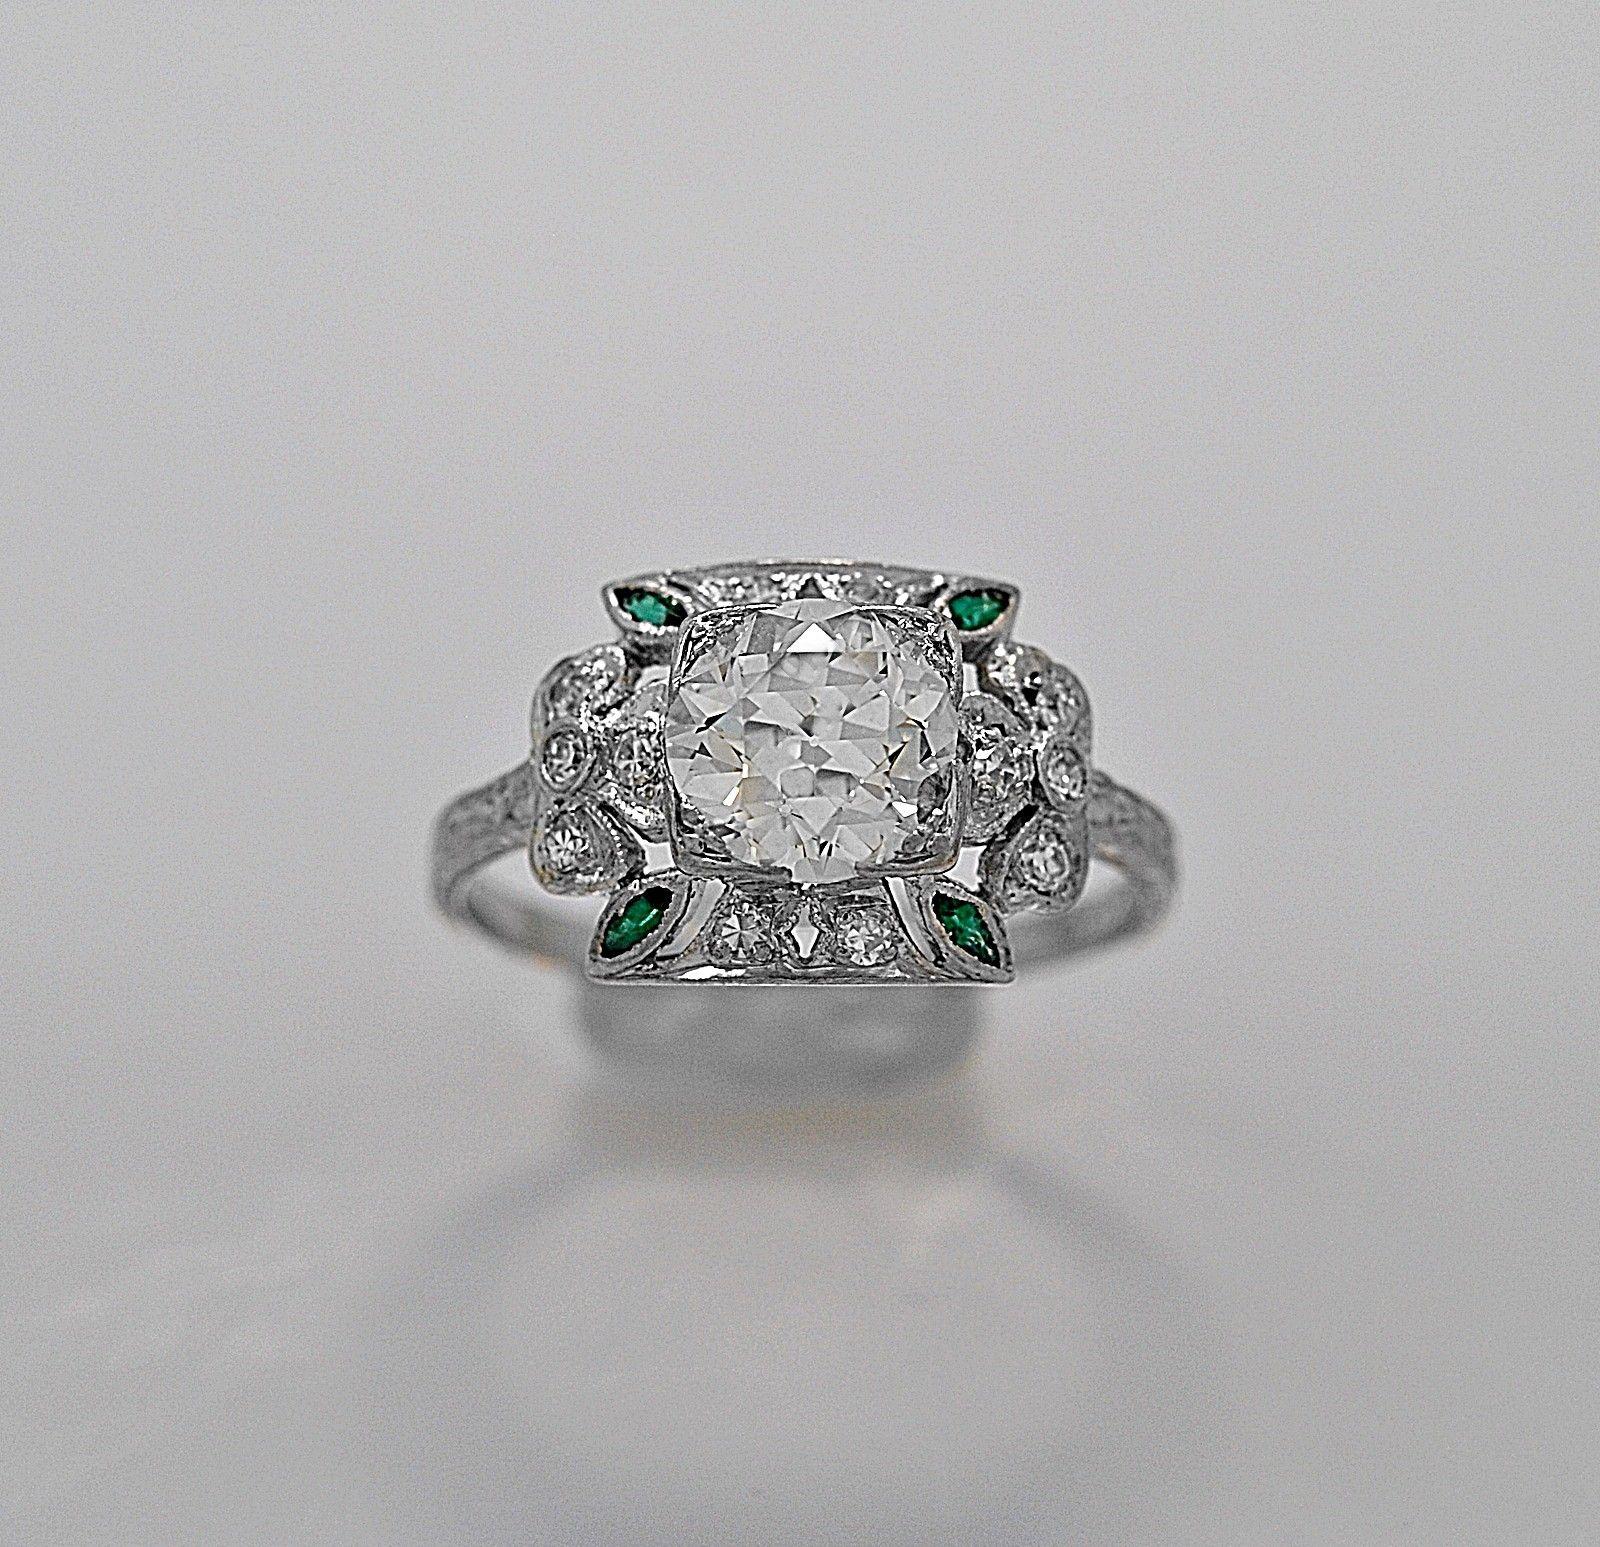 Ring · A Rare Antique Engagement